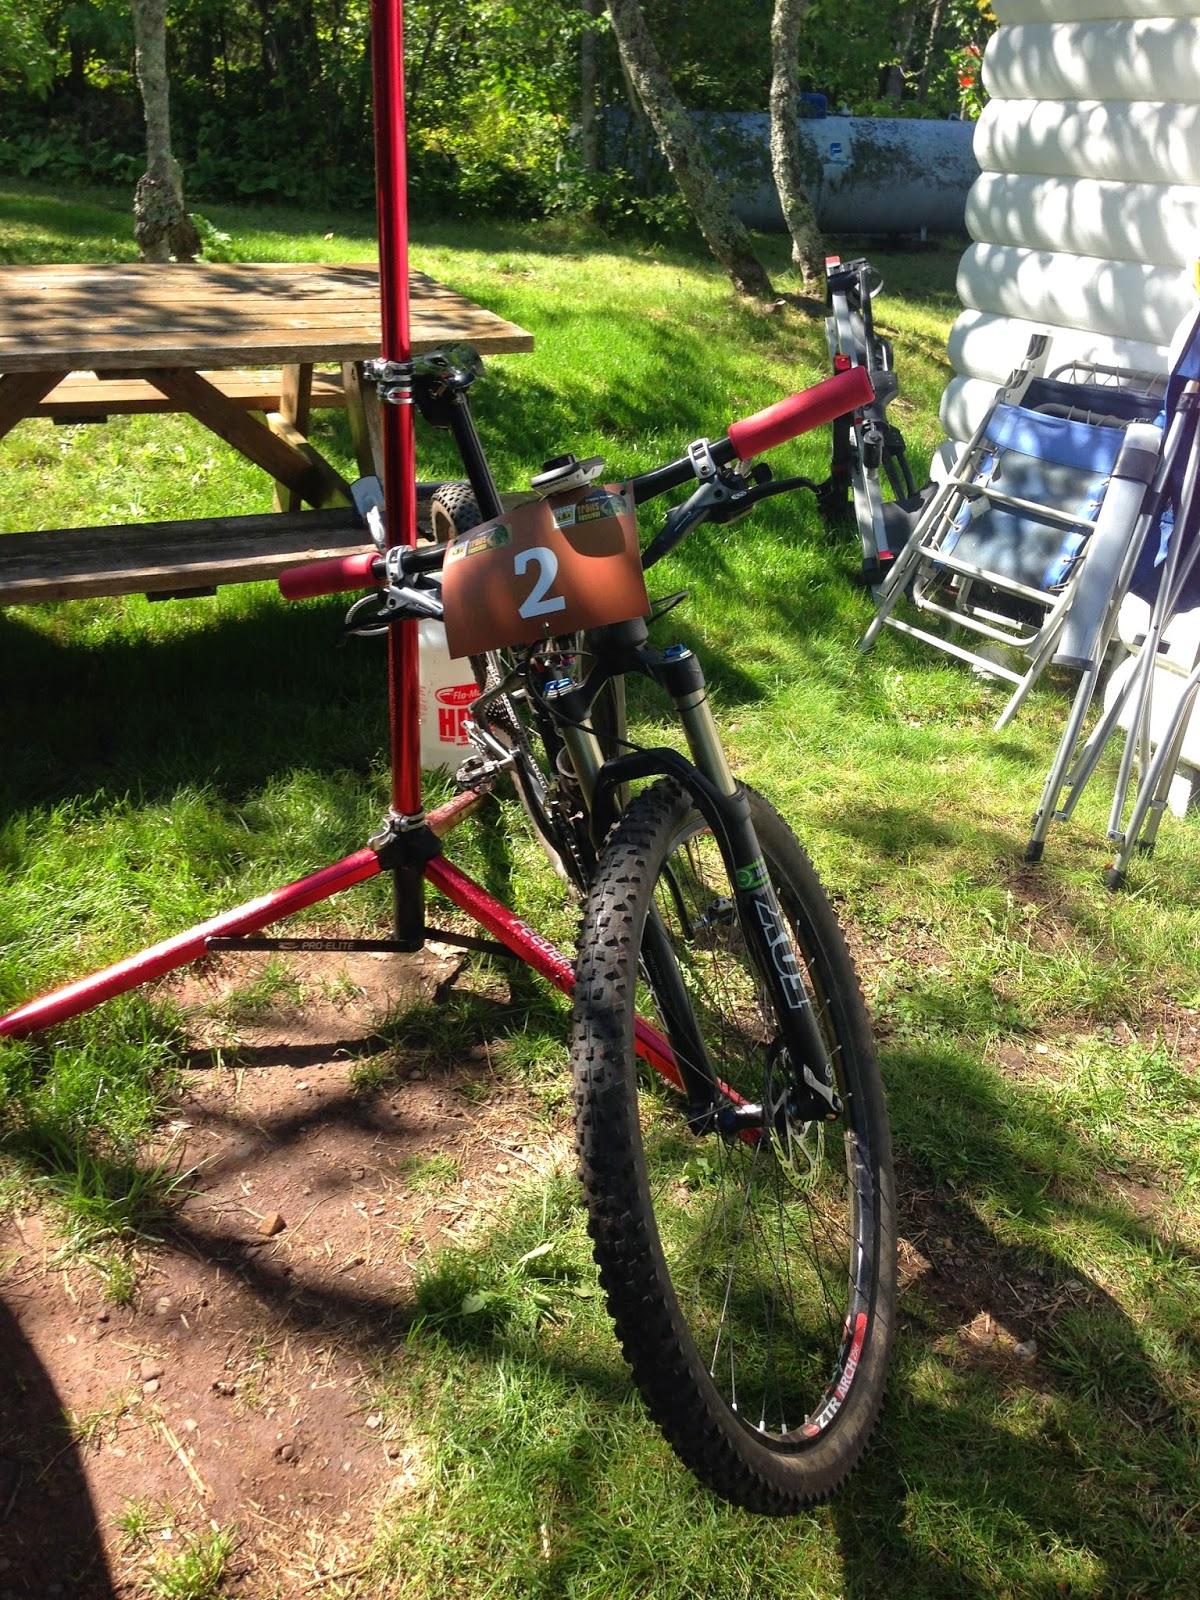 Farm Team Racing Home Of The Farmhand Fat Bike Race